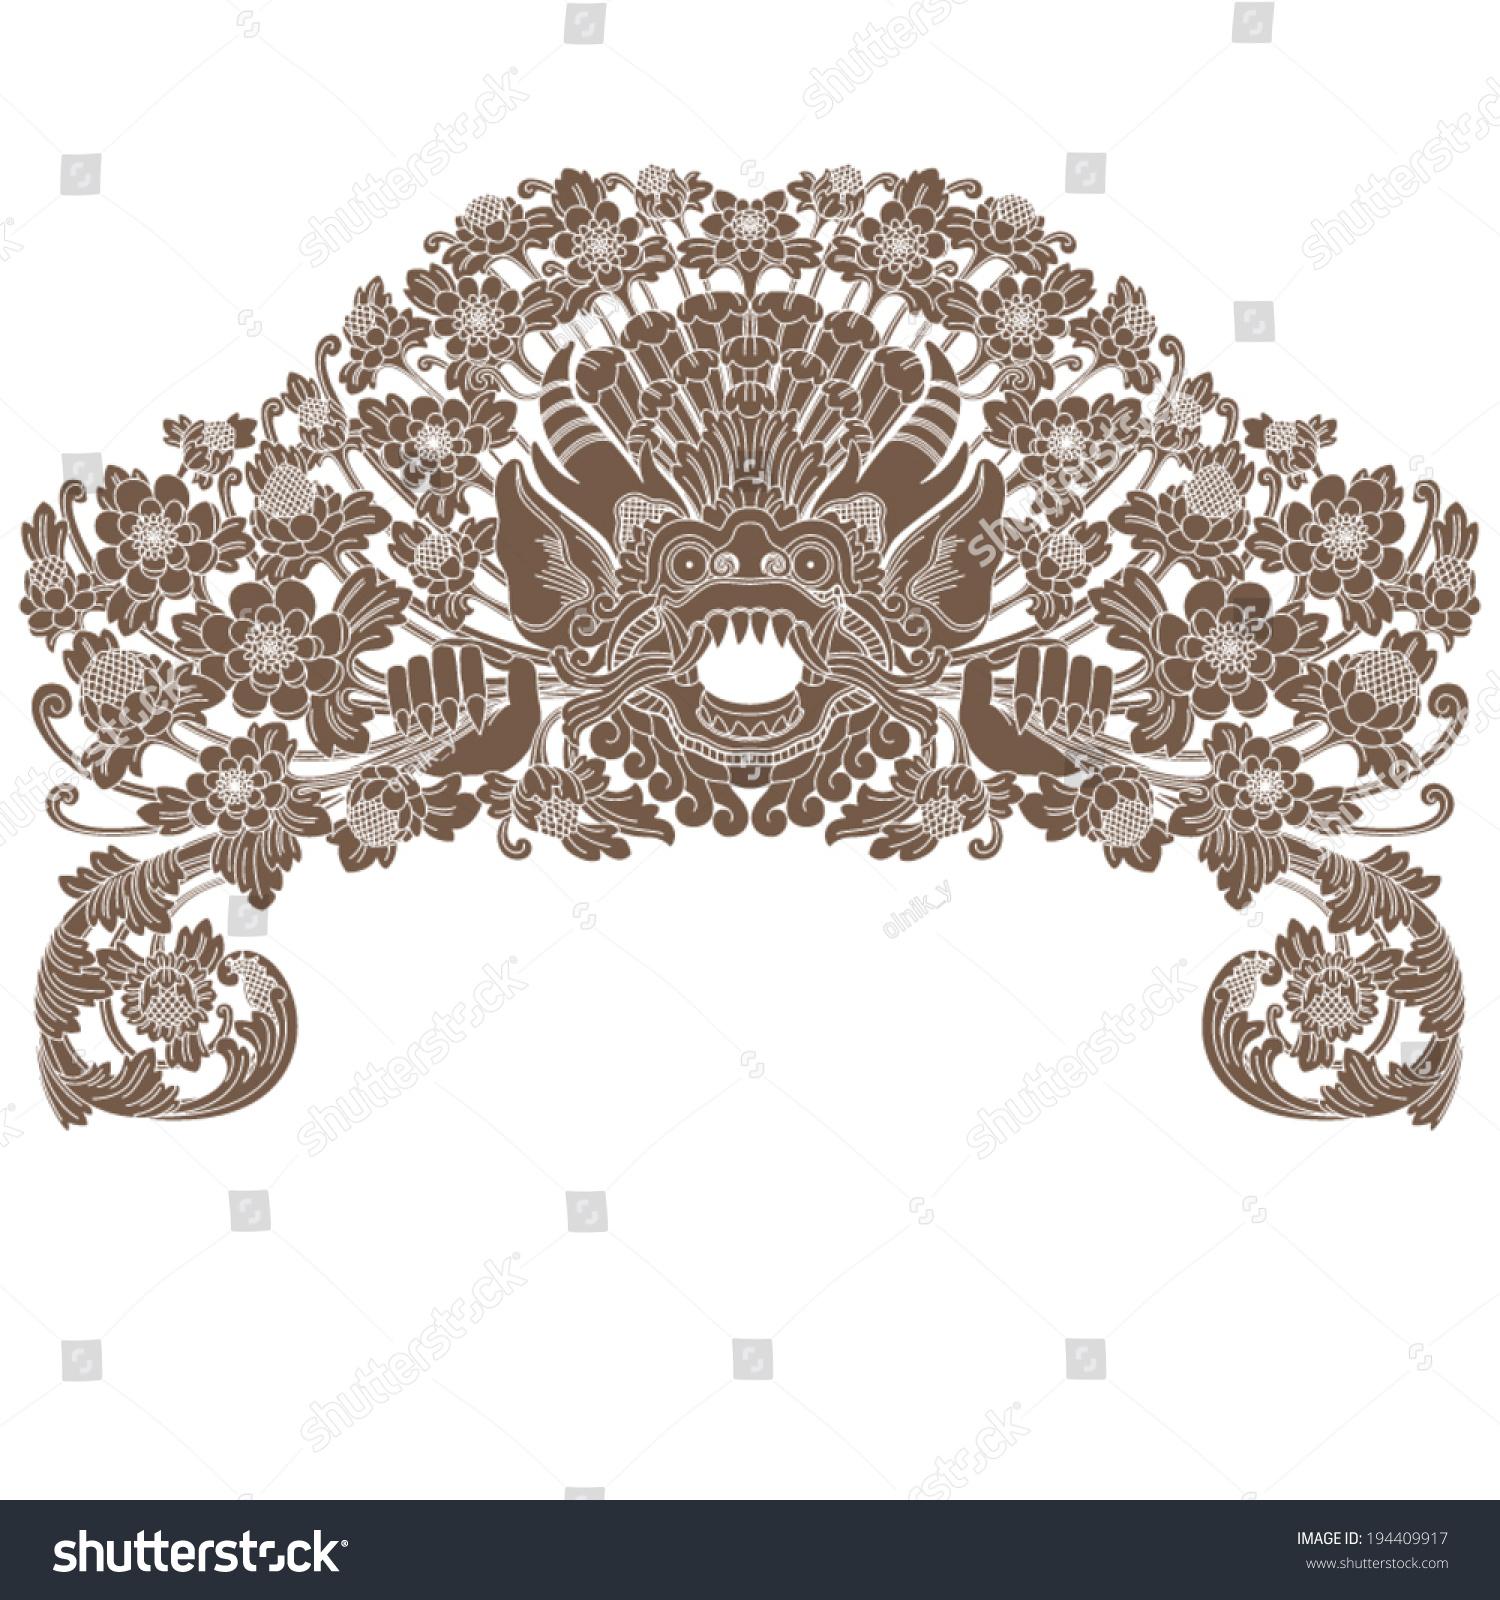 mythological god ornament stock vector royalty free 194409917 https www shutterstock com image vector mythological god ornament 194409917